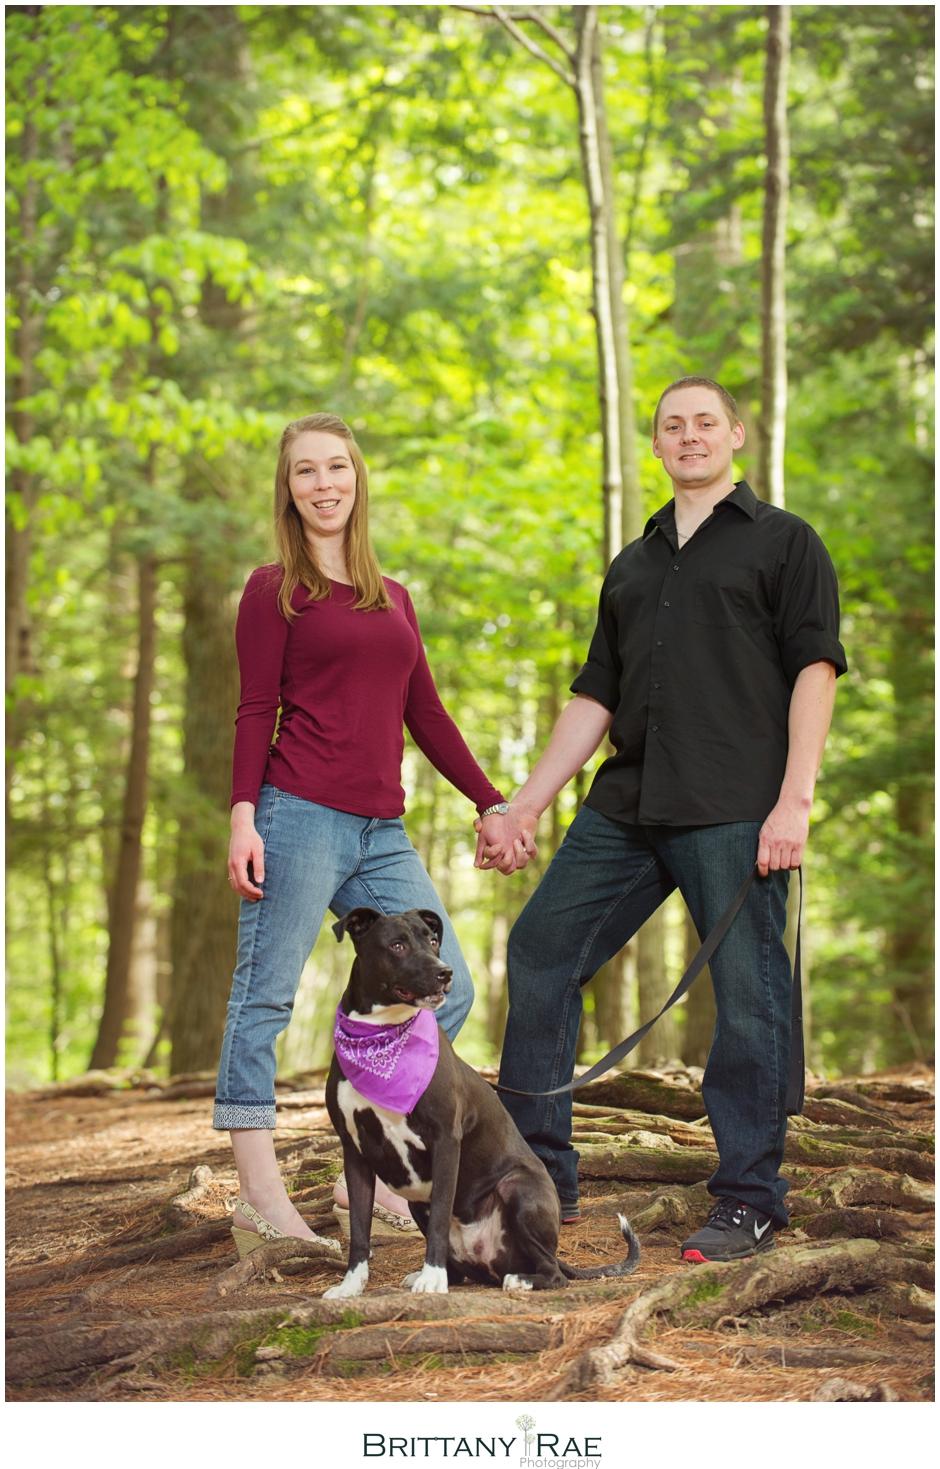 080214 - Danielle & Josh - engagement-19_WEB-Maine Wedding and Portrait Photographer